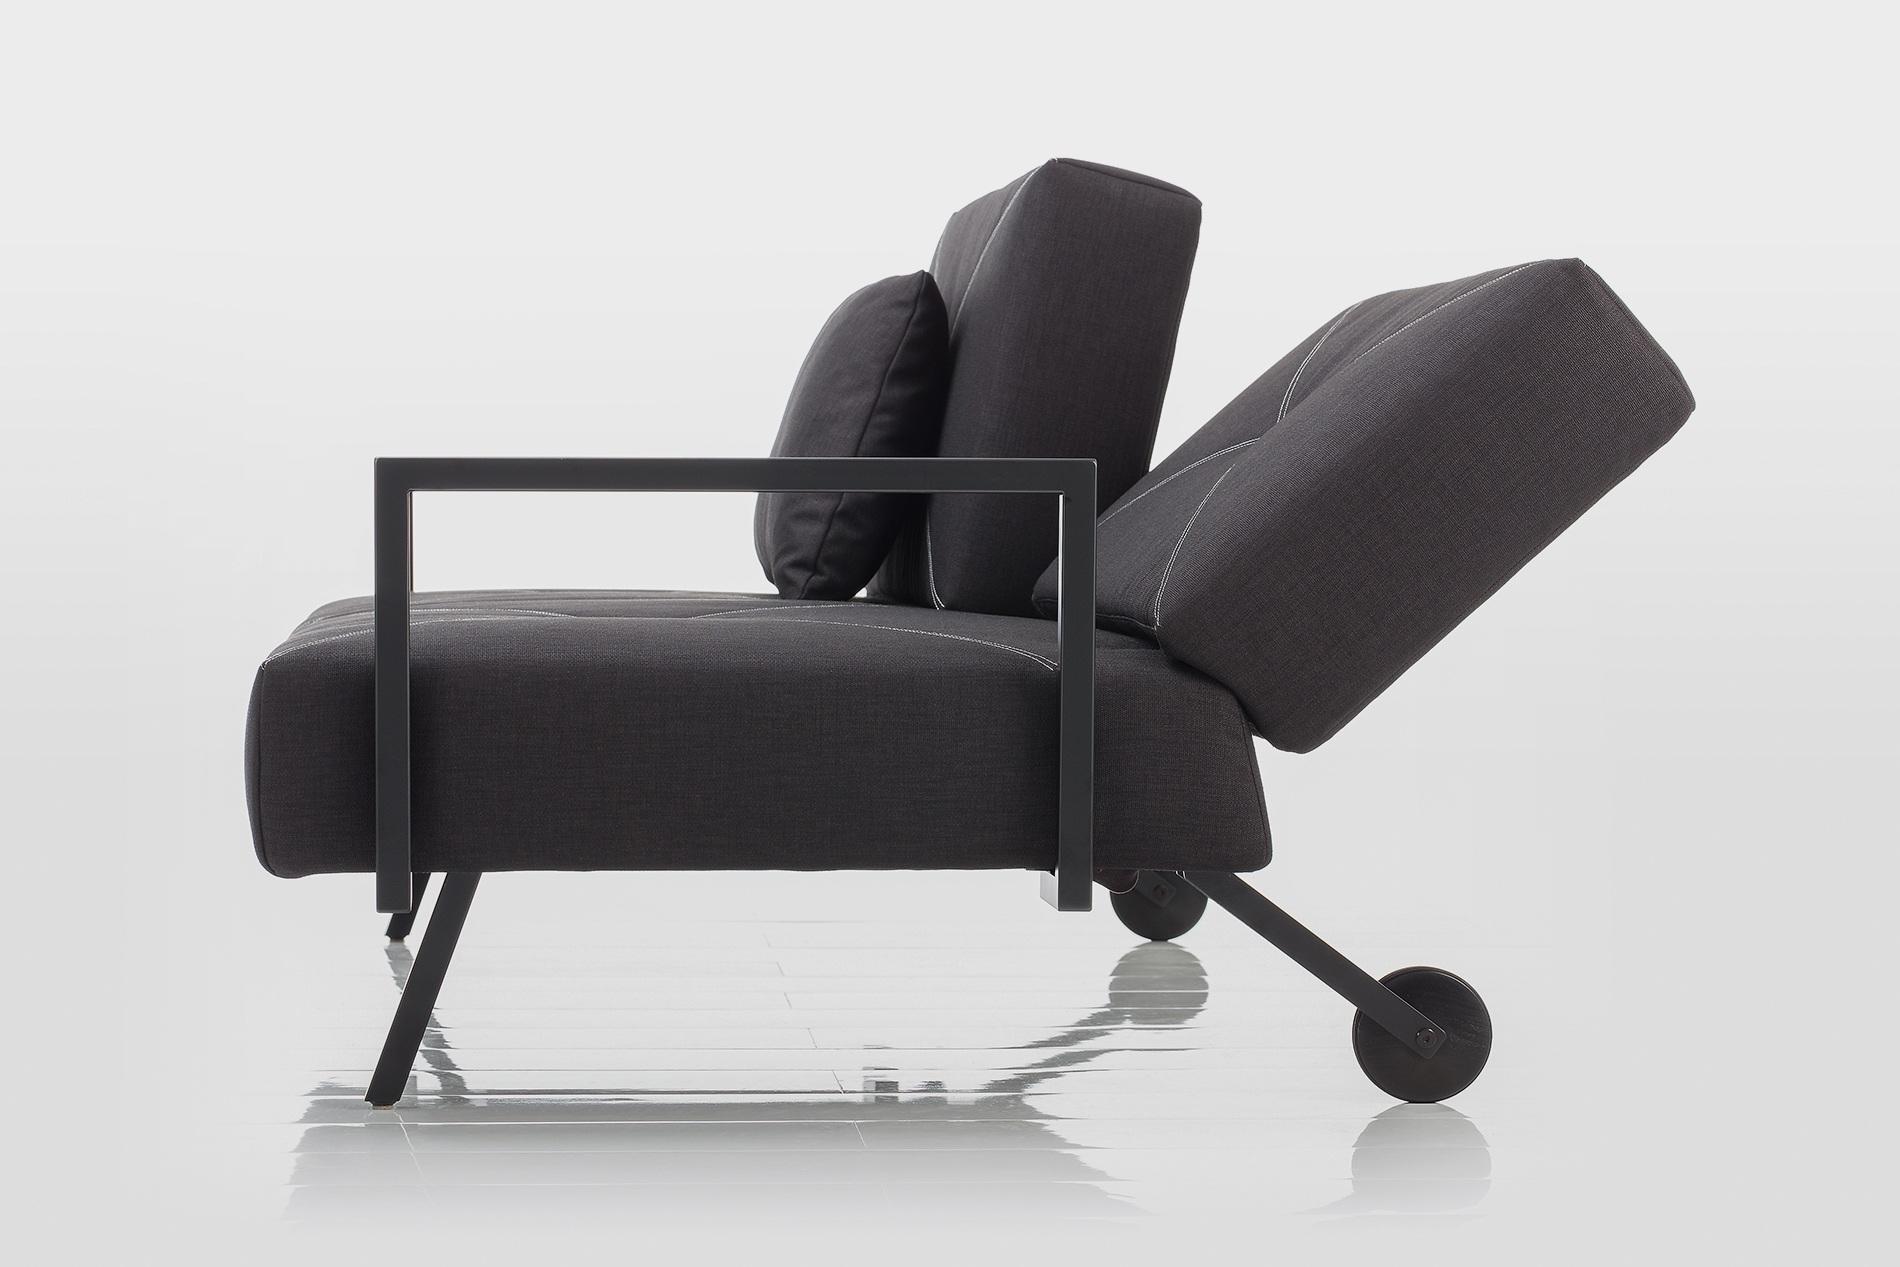 sofa concert von br hl das designer schlafsofa. Black Bedroom Furniture Sets. Home Design Ideas